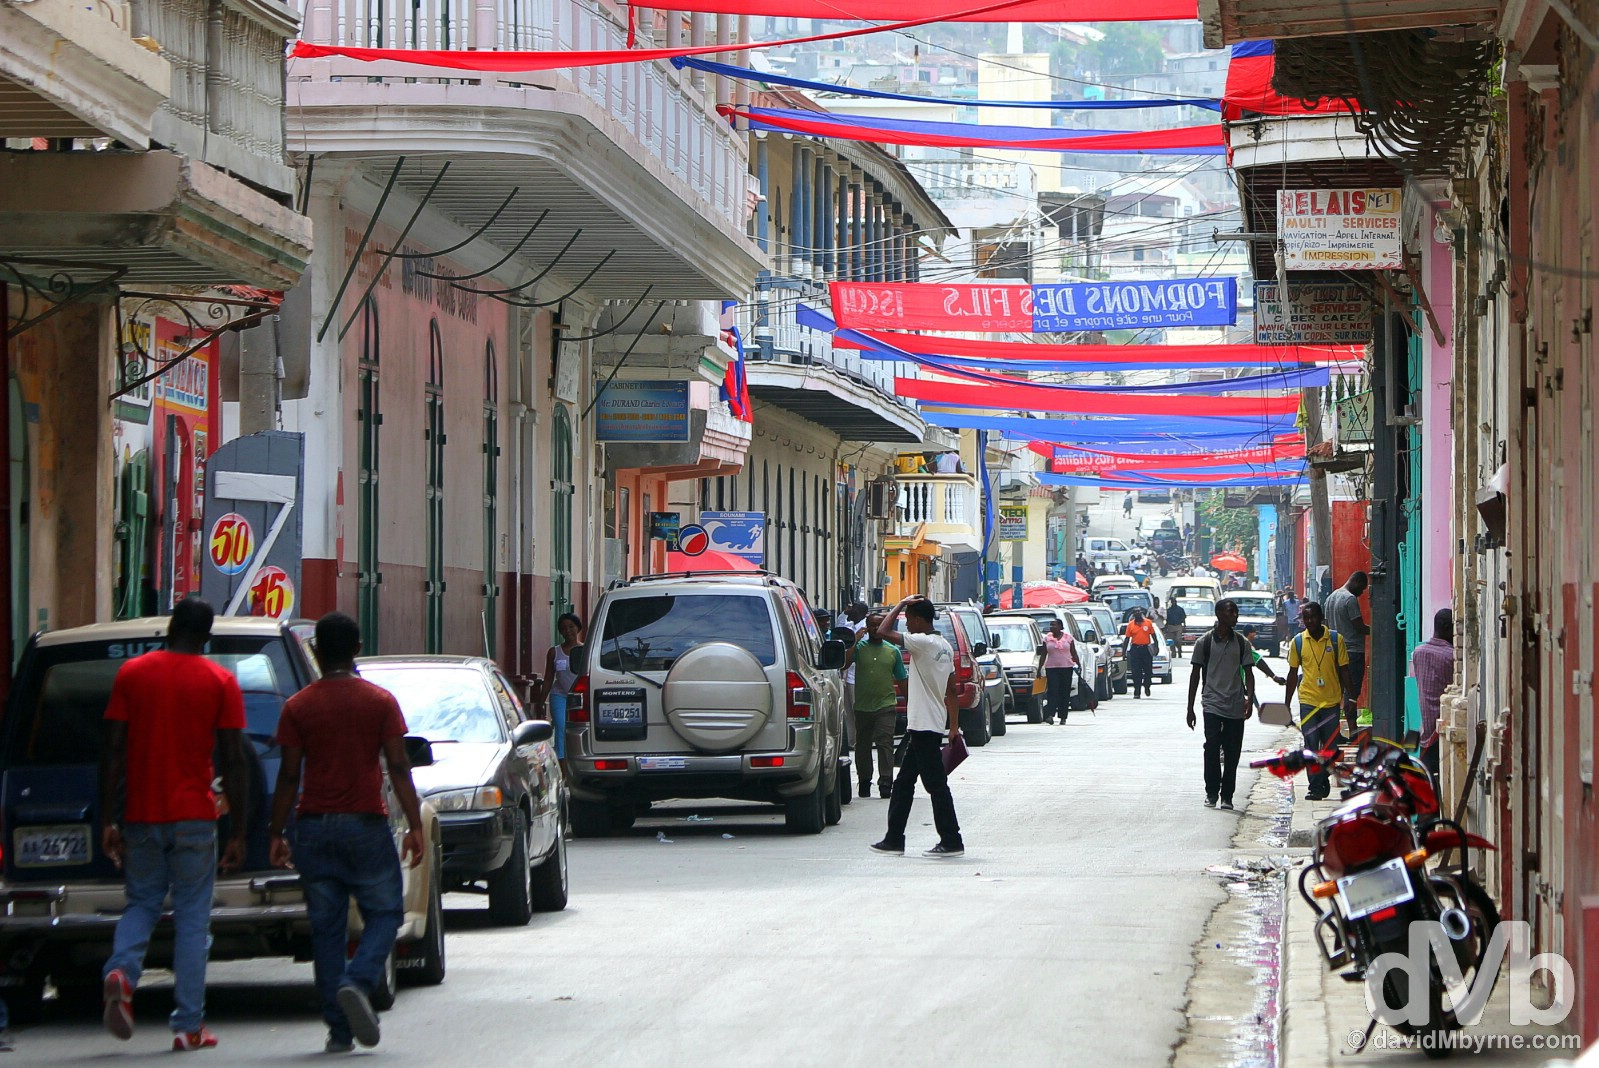 of Worldwide Destination  - streets Haiti The Cap-Haïtien